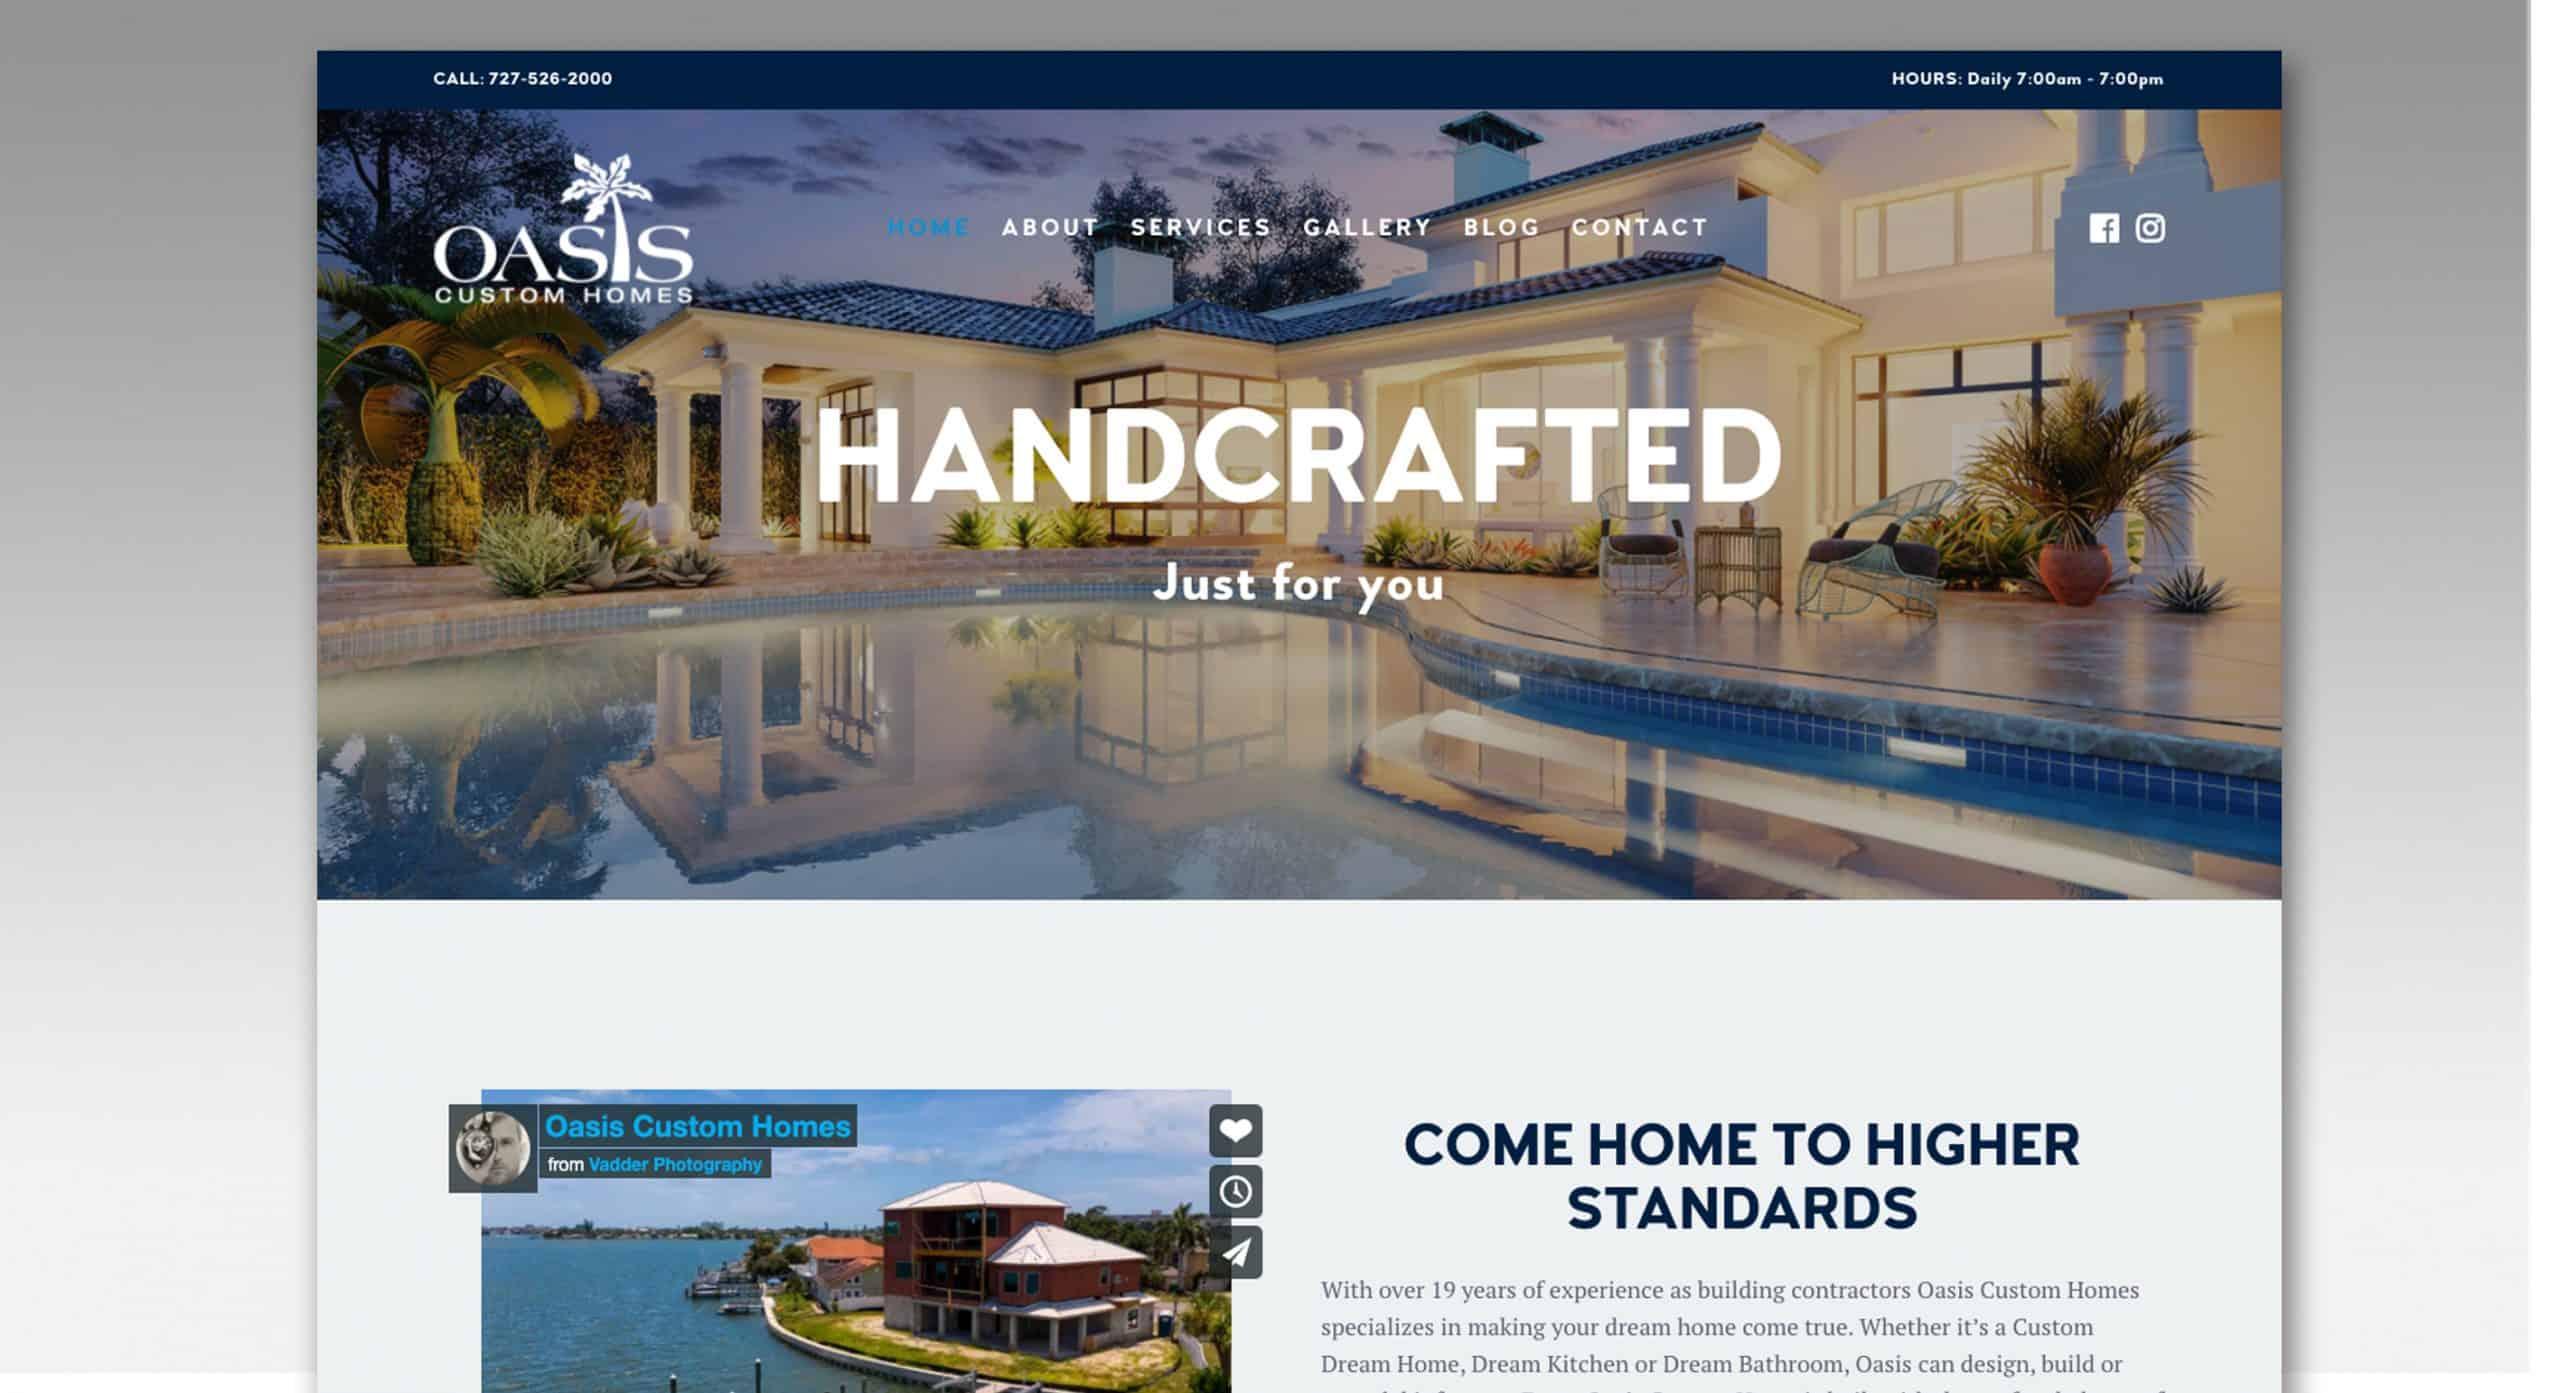 Oasis Custom Homes